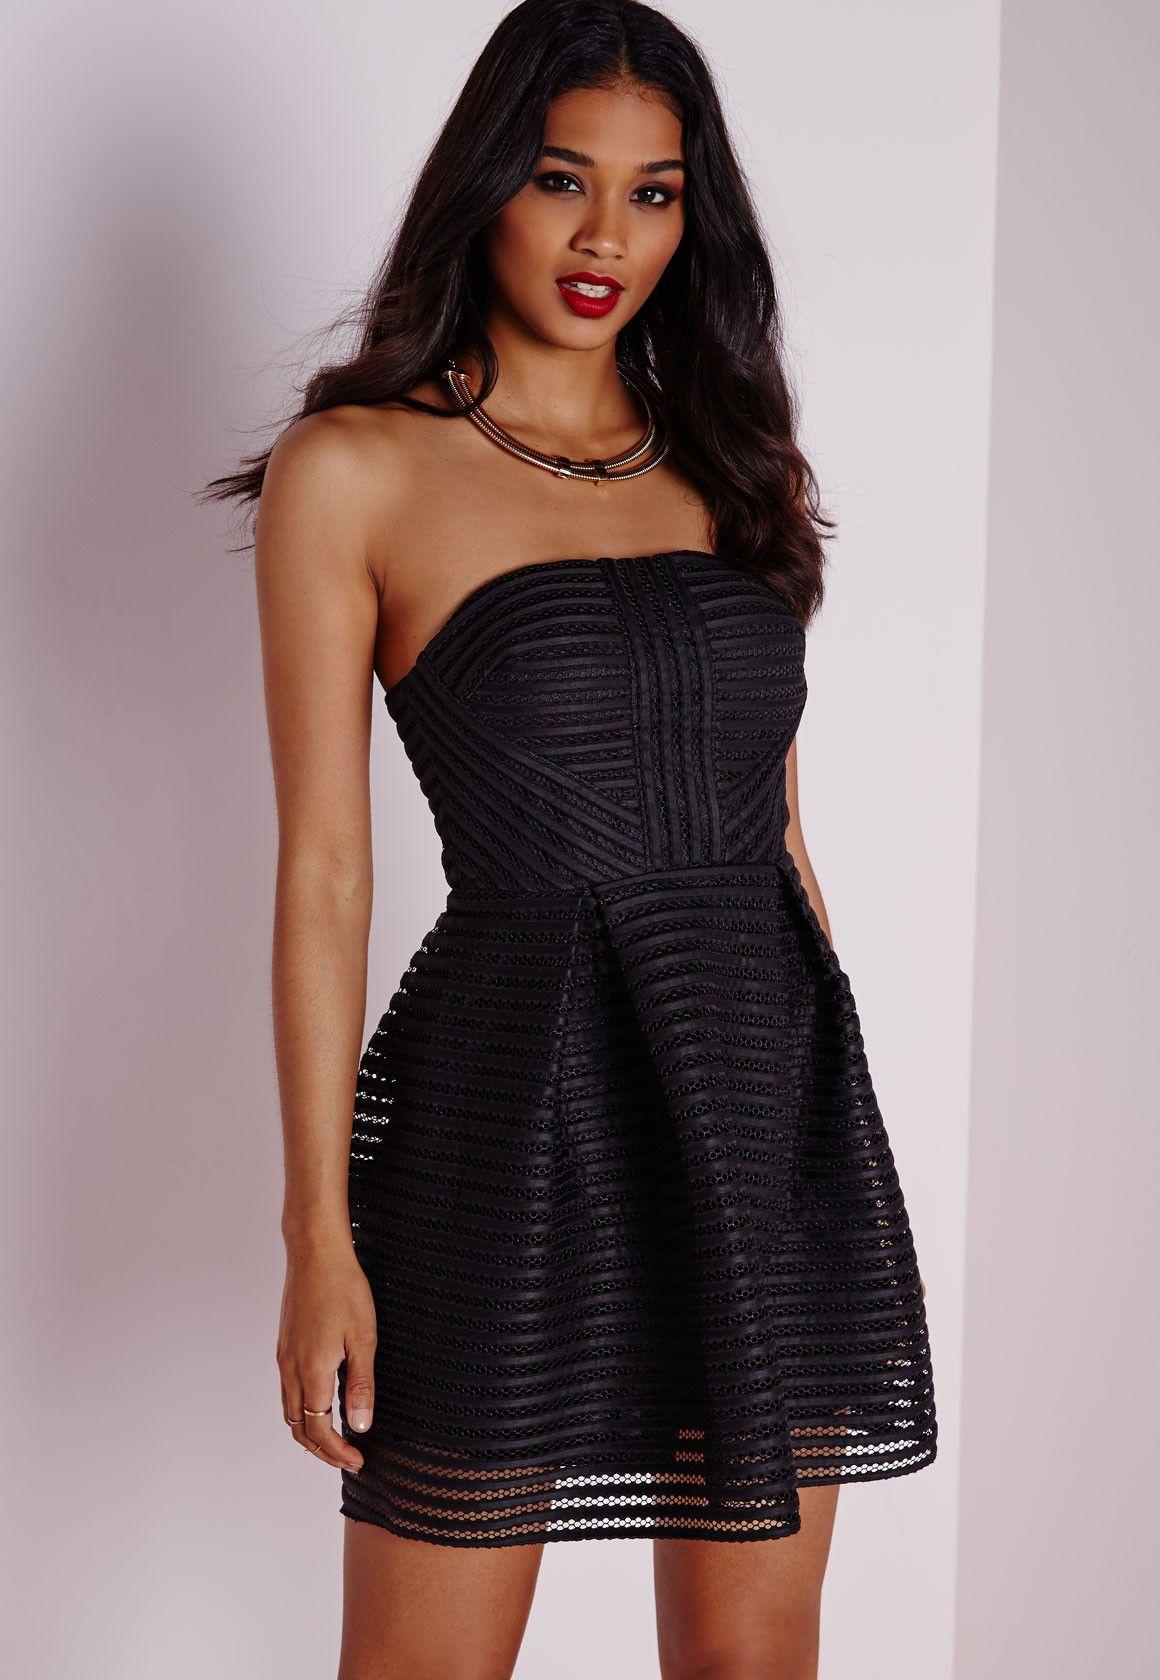 Mesh Strapless Skater Dress Black Dresses Skater Dresses Black Dresses Online Mesh Tube Dress Short Sleeve Mini Dress [ 1680 x 1160 Pixel ]